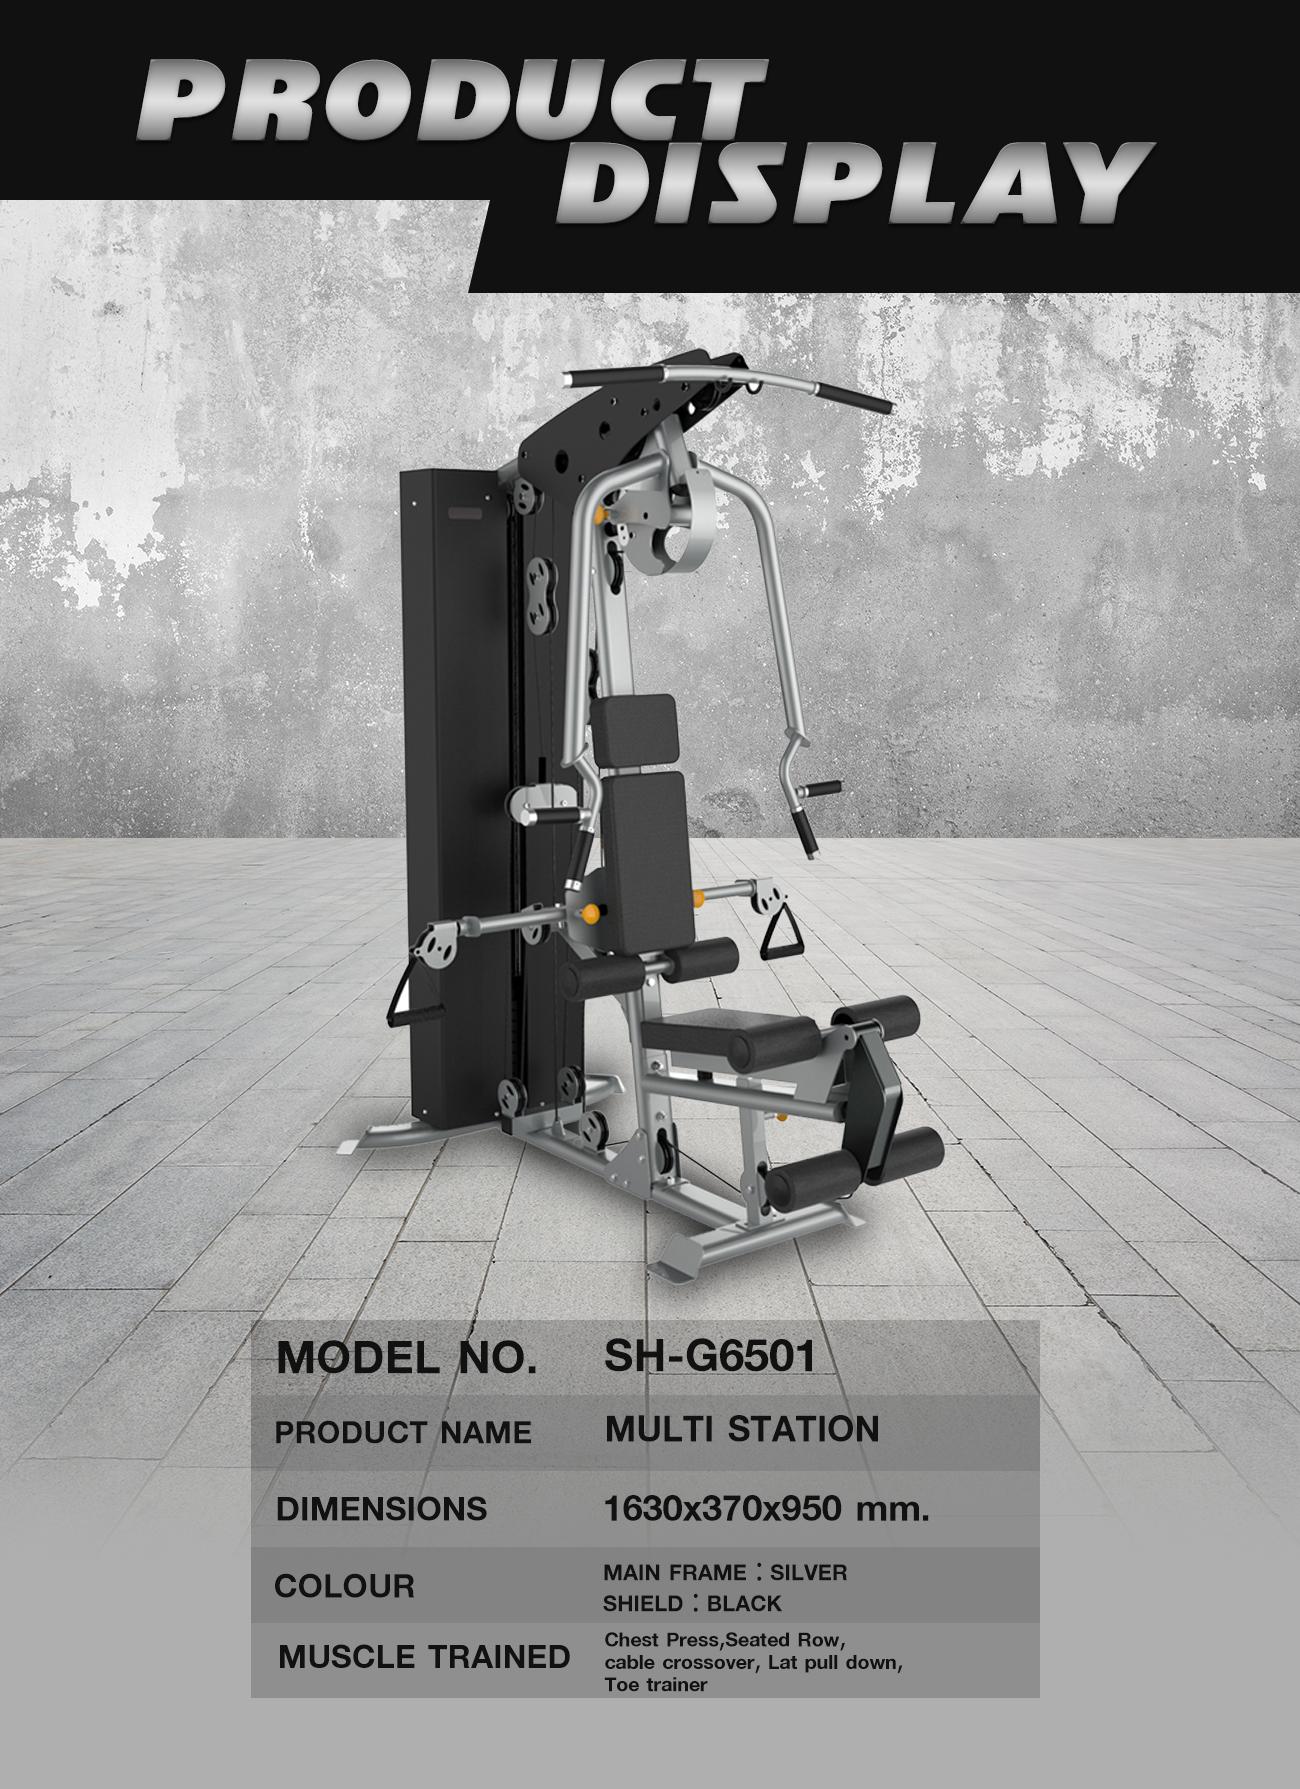 Multi station (SH-G6501)